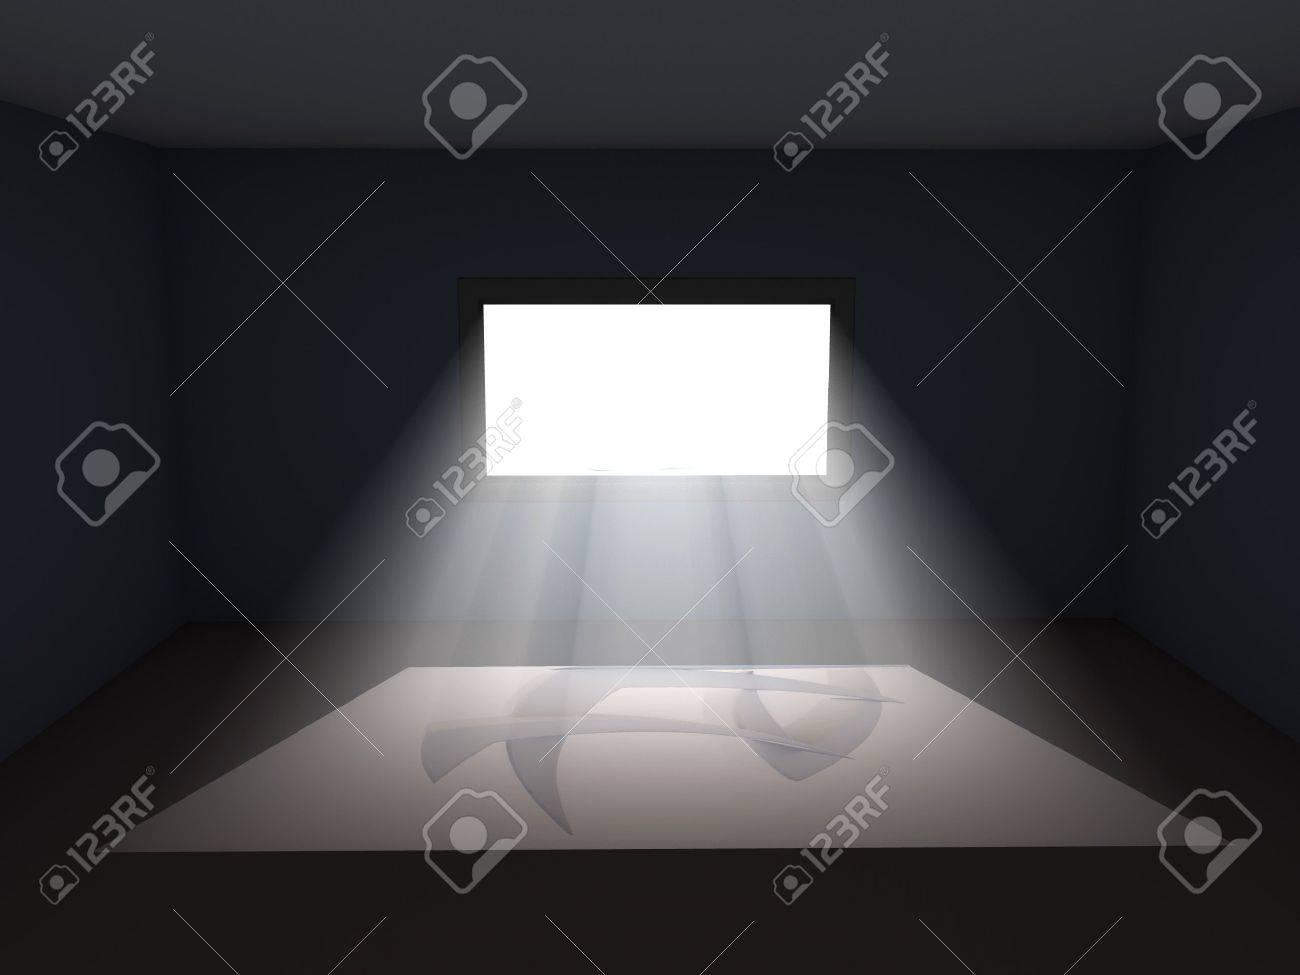 Dark room with light through window - Light Coming Through Window In Dark Room Illustration Please Check My Portfolio For Similar